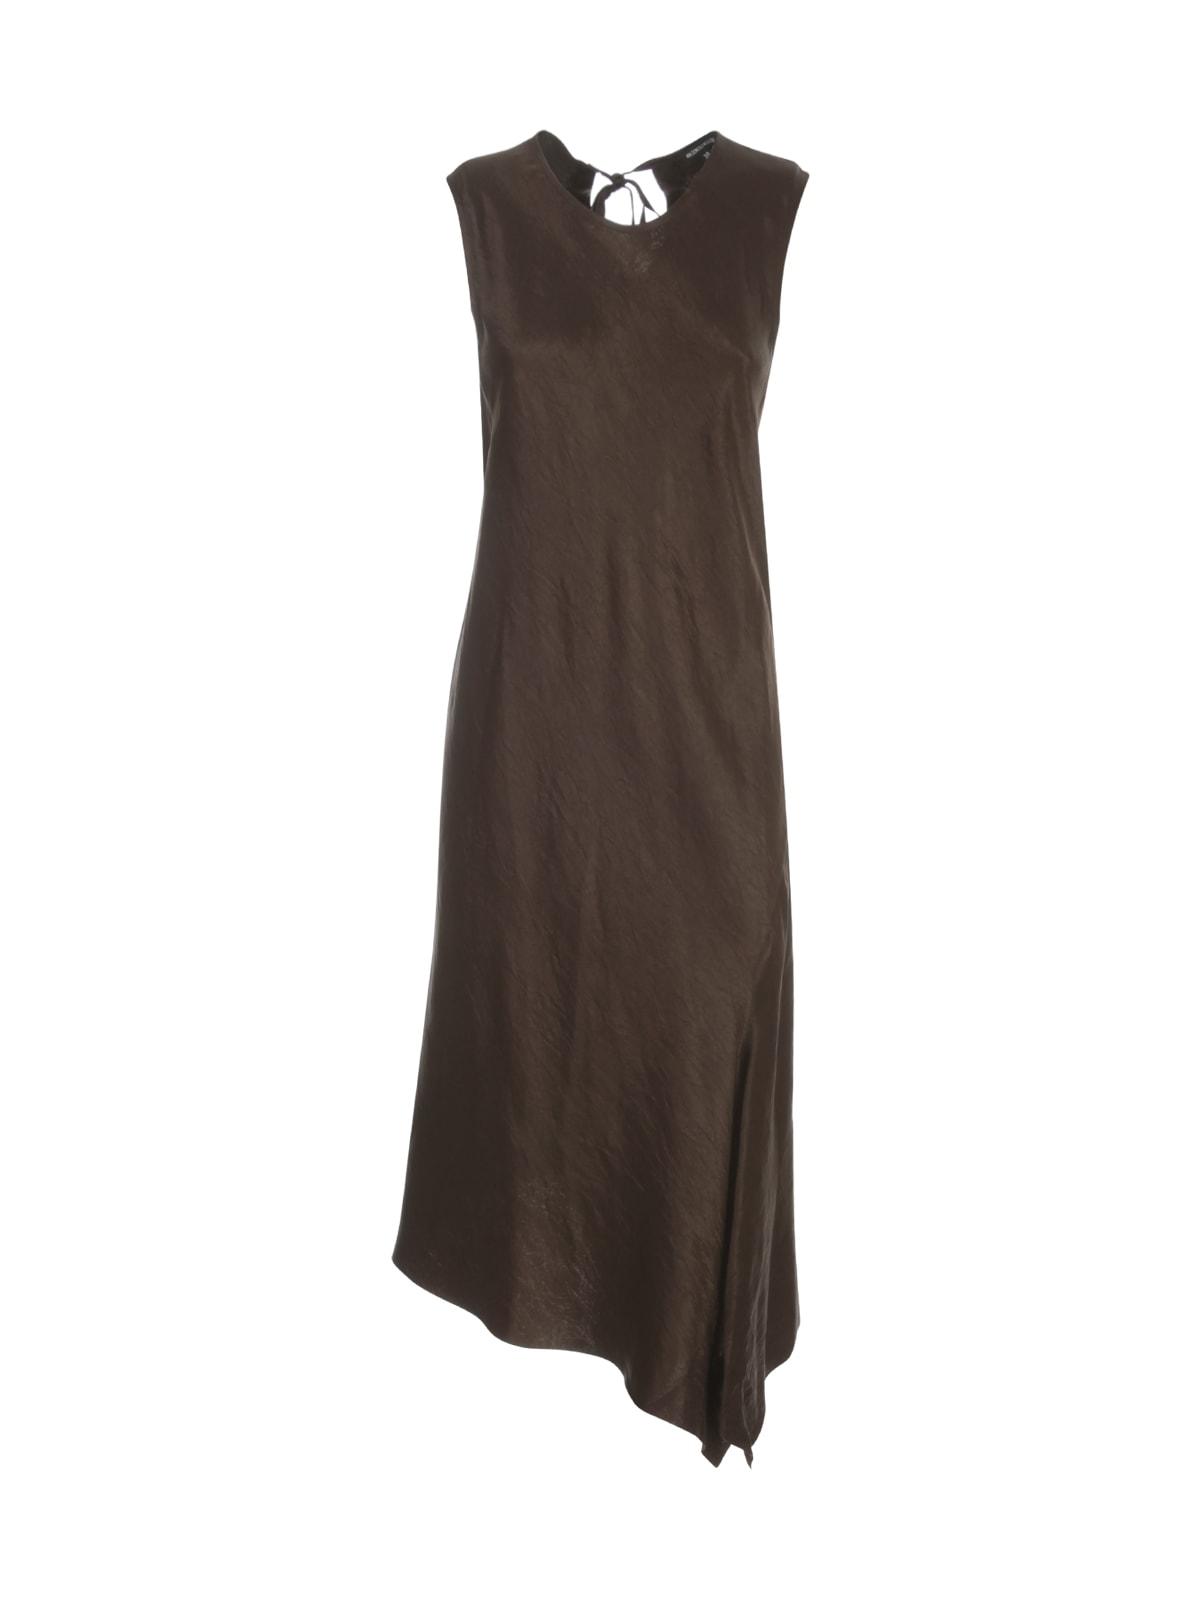 Ann Demeulemeester LAMBETH DRESS